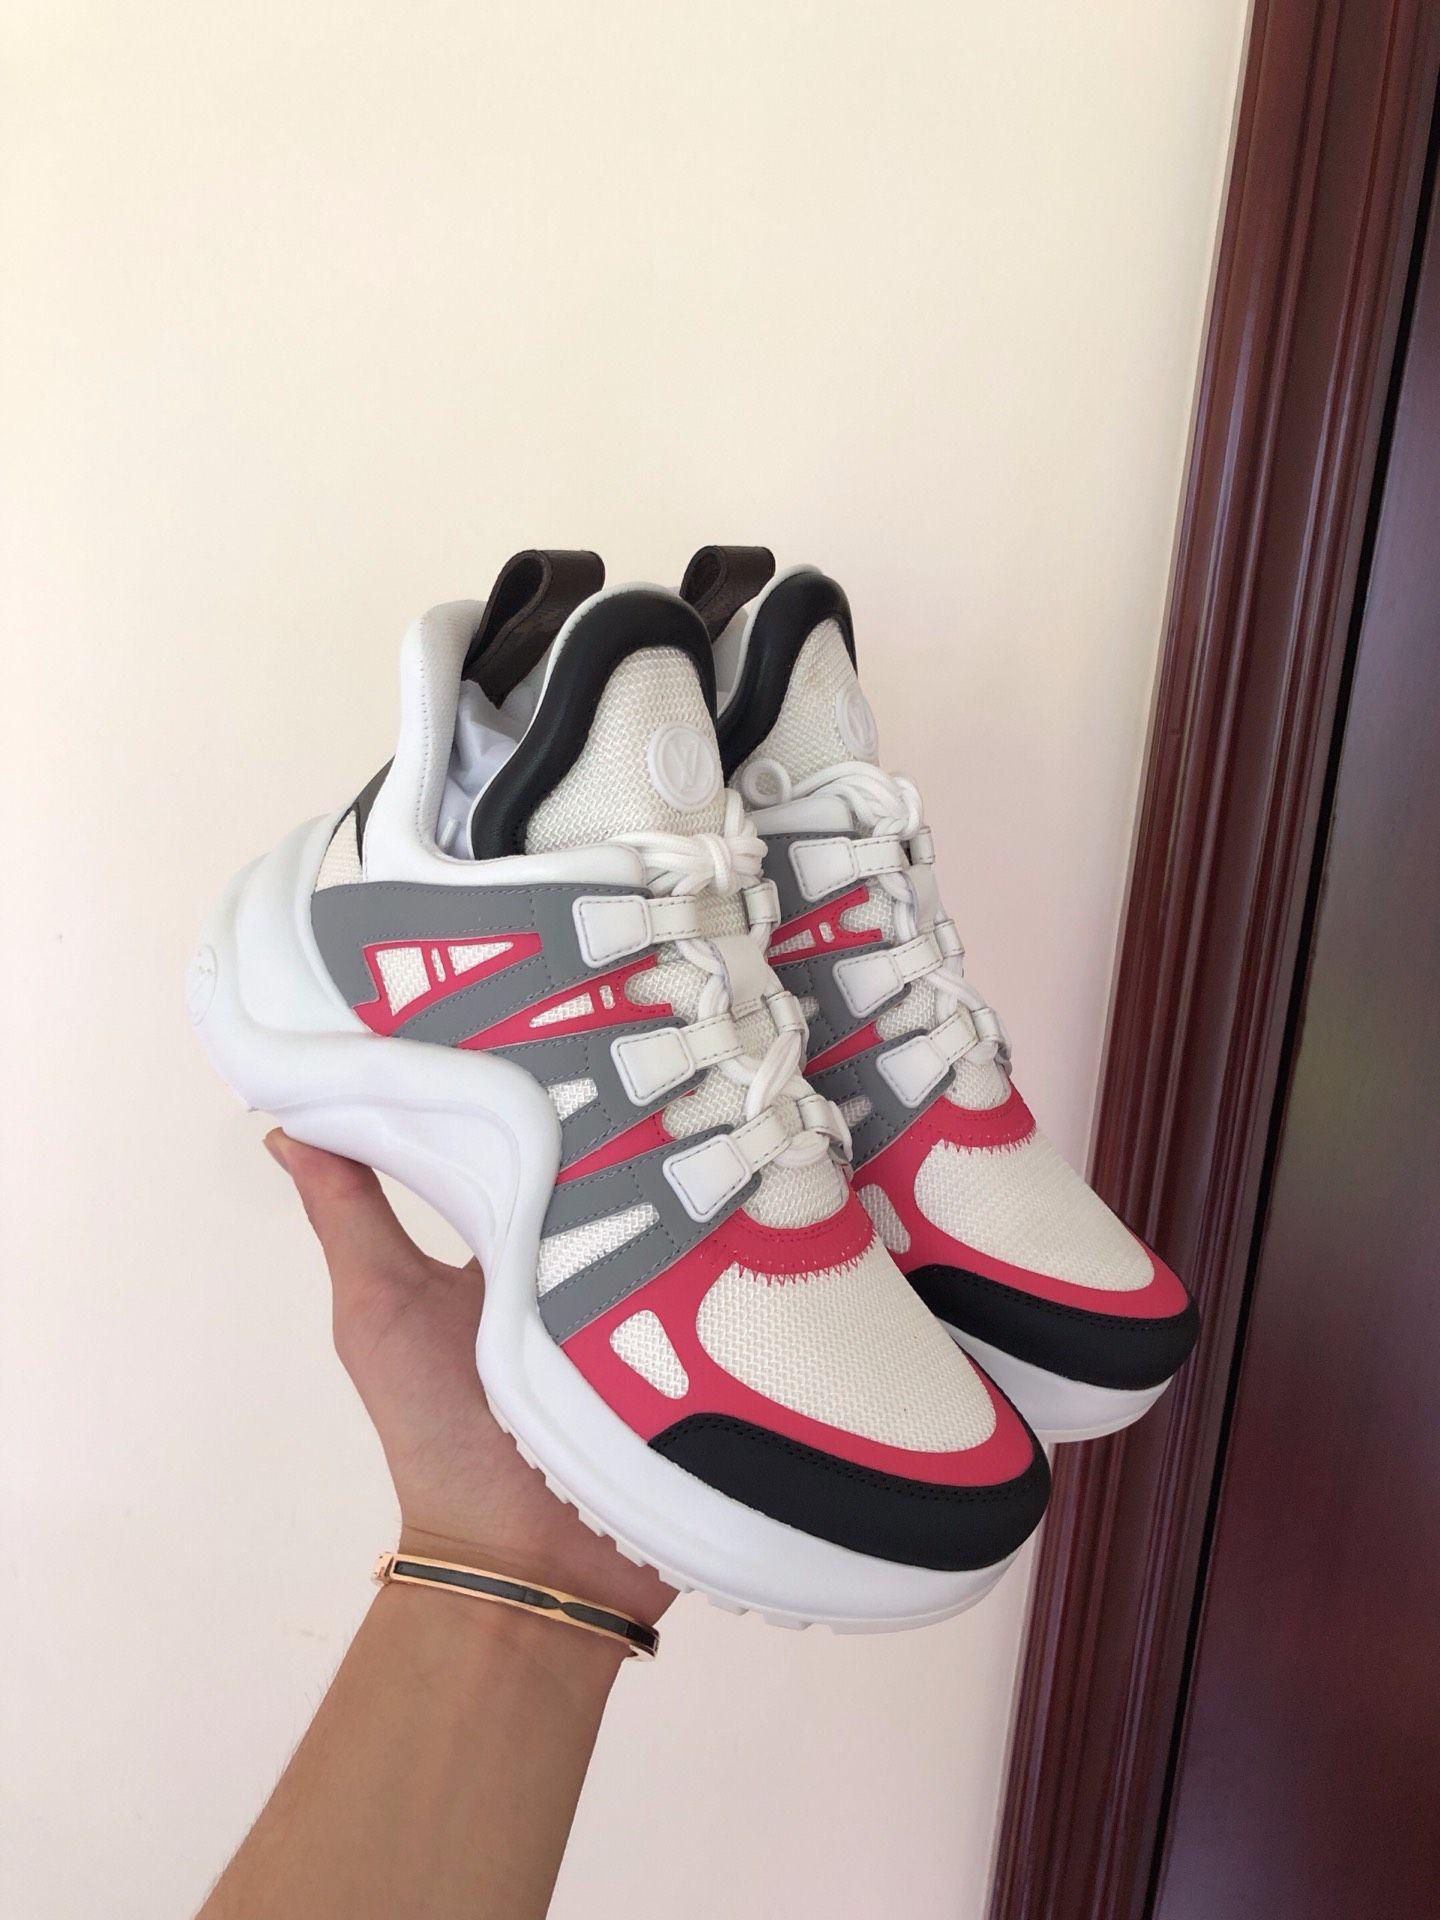 newest    archlight sneaker Rose Clair Pink  1A4X75    women sneaker  9